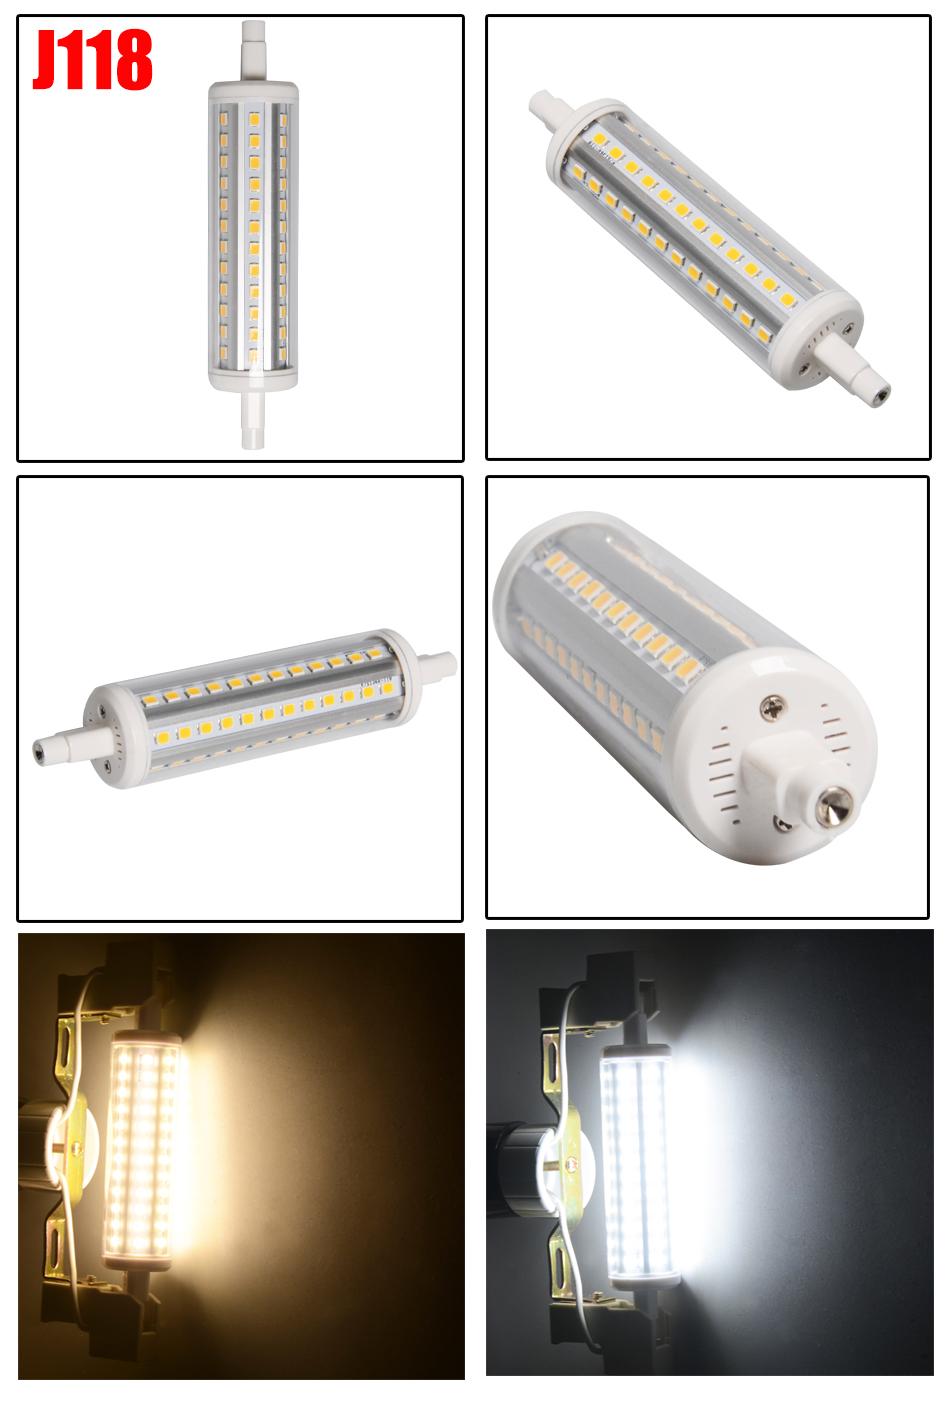 R7s 78mm 118mm 5w 10w Led Smd Security Flood Light Bulb